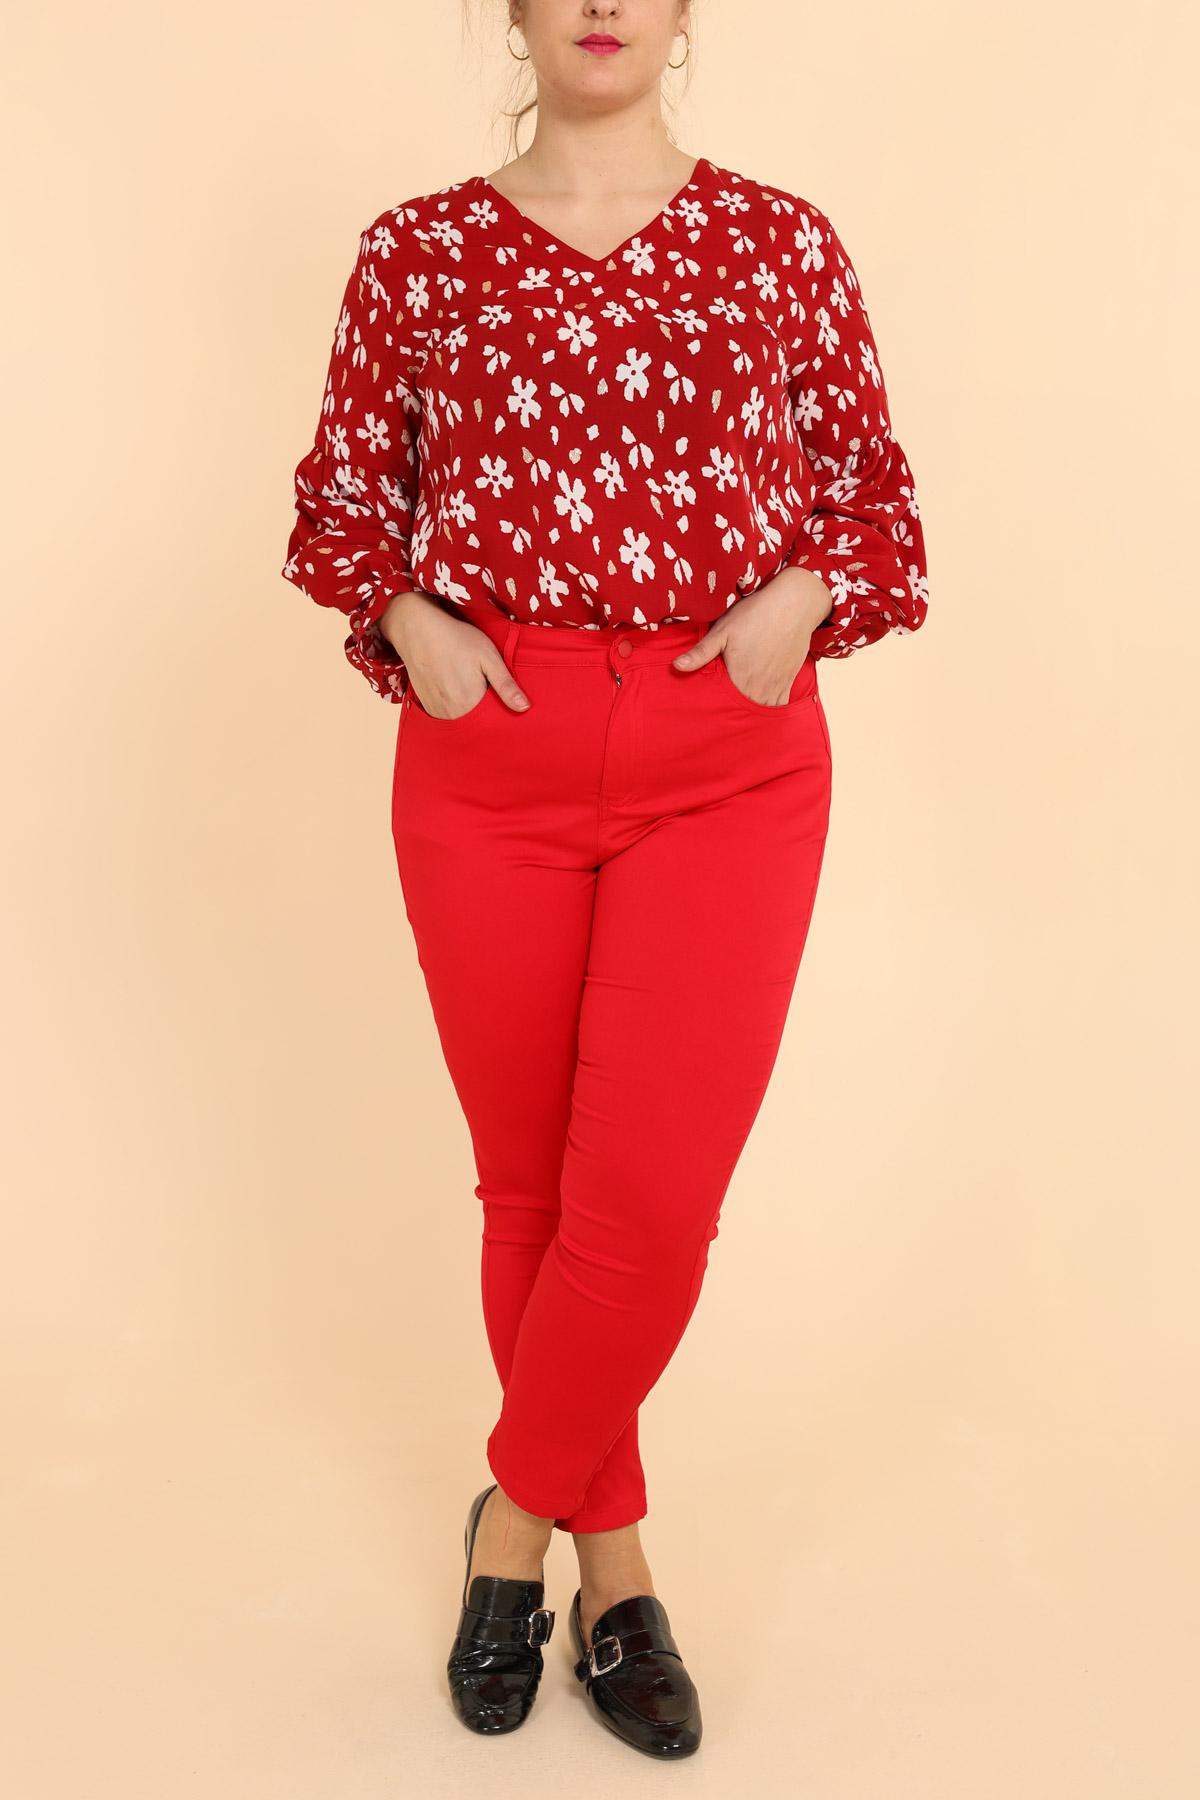 pantalon grande taille femme pomme rouge b302 rouge 42-56